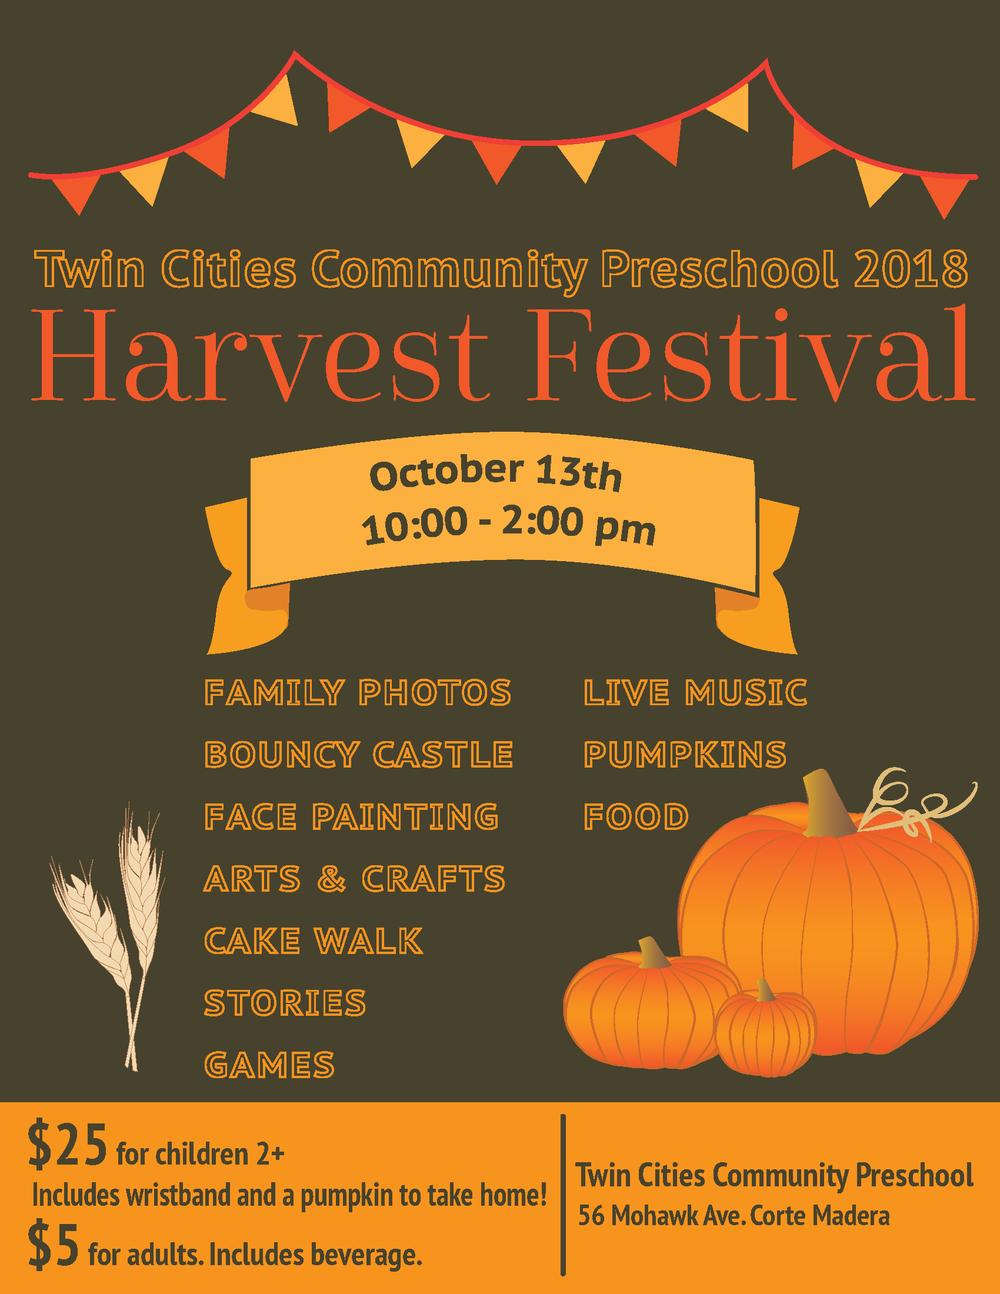 TCCP harvest festival 2018 flyer final.png